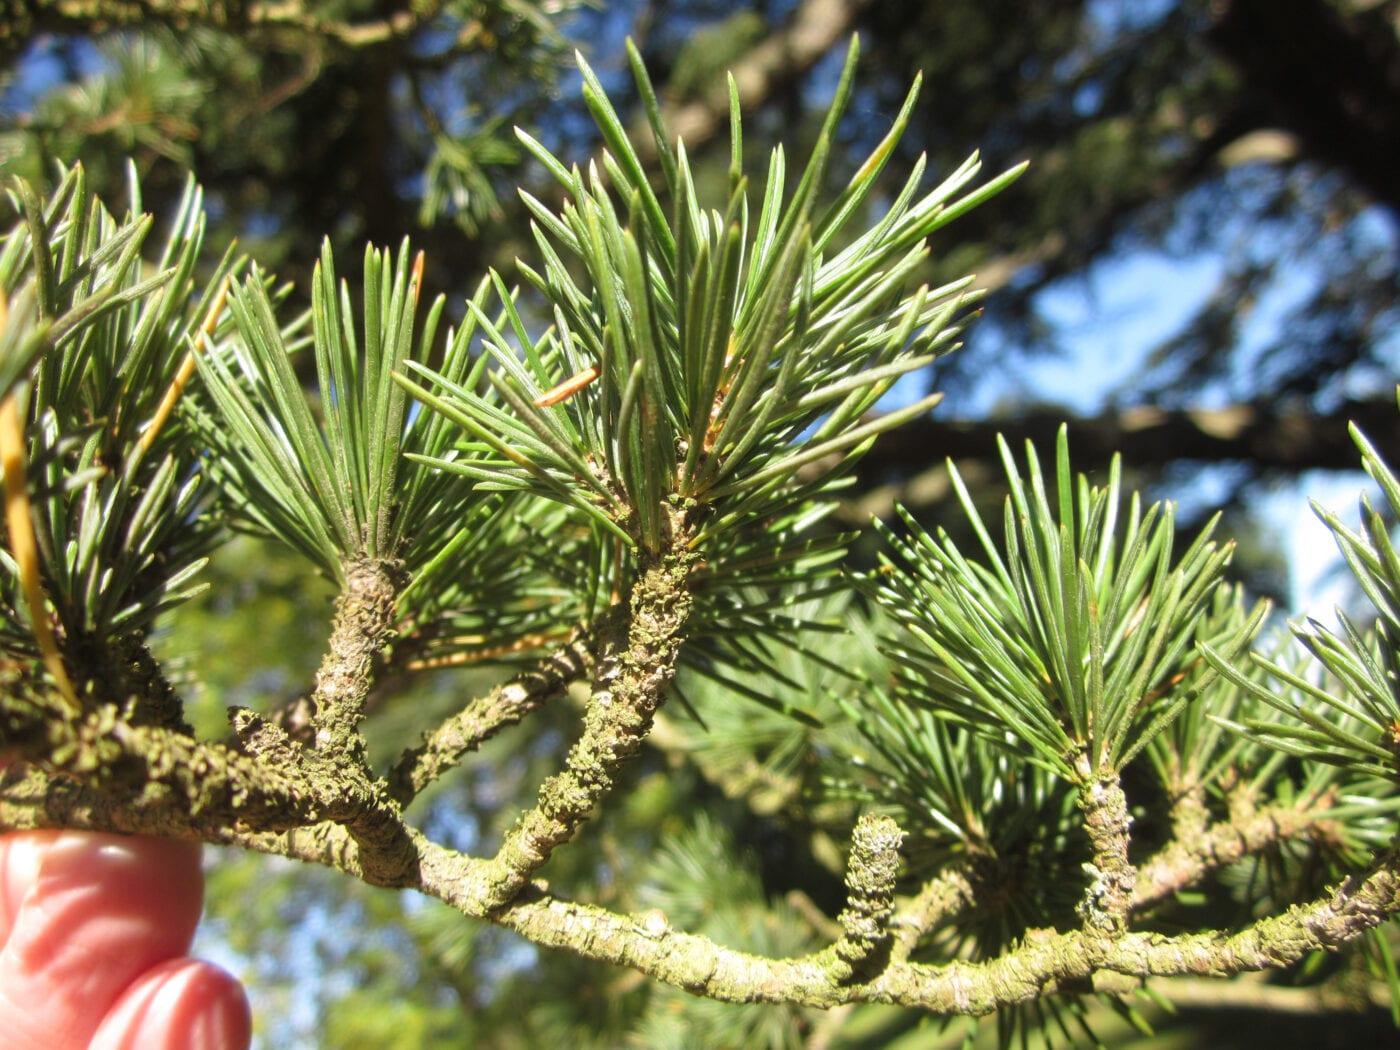 Cedar of Lebanon needle clusters